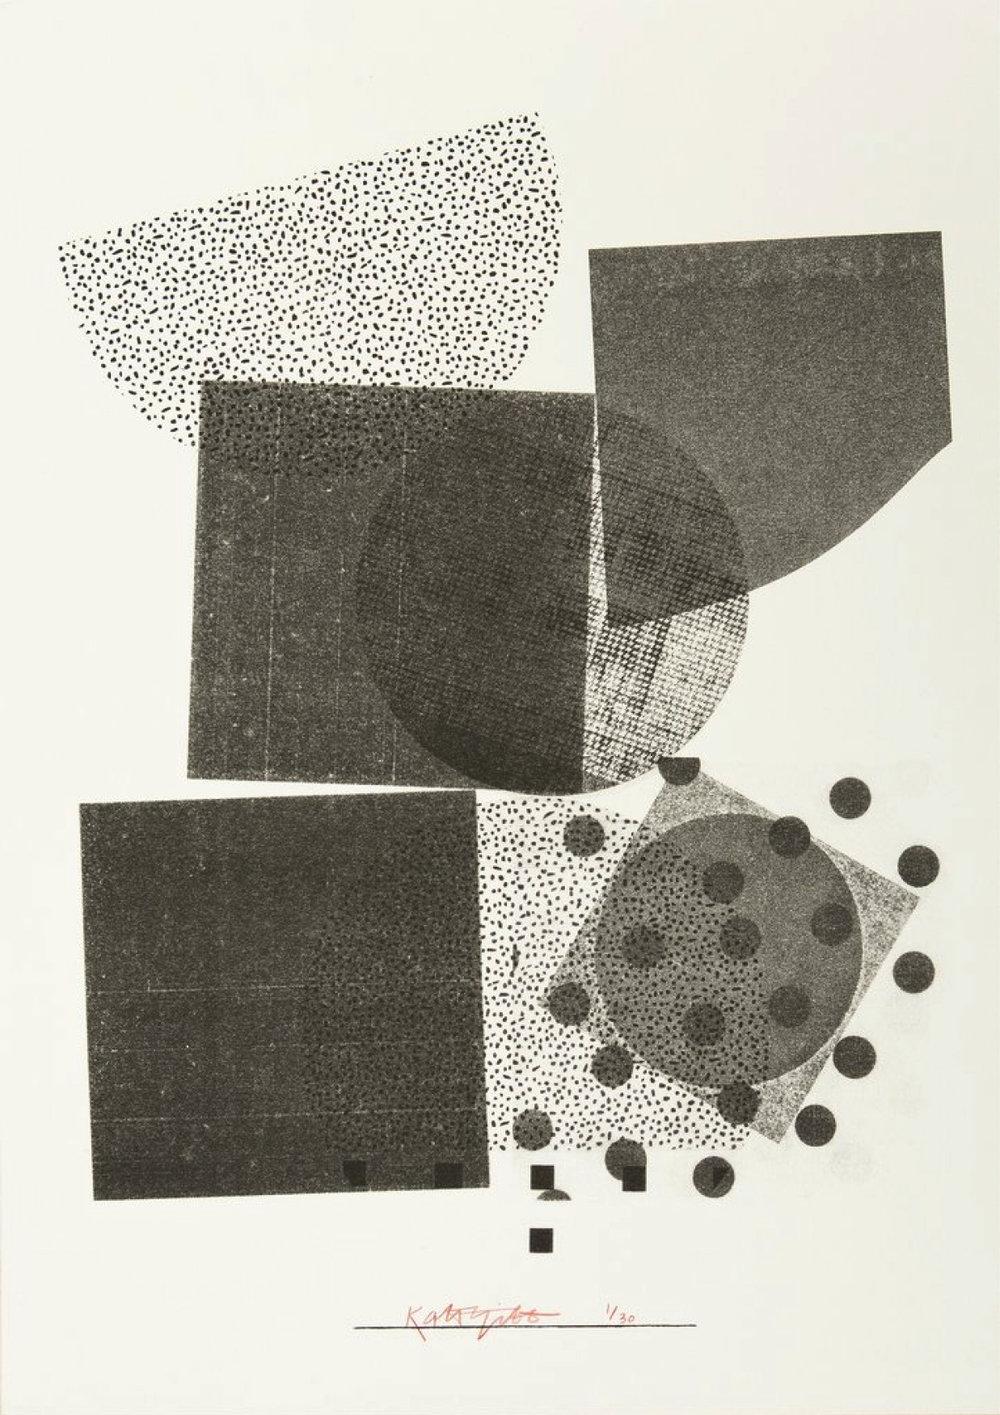 Kate Gibb #5, £50 (Signed & Numbered)  —Kate Gibb, Yuck Print House